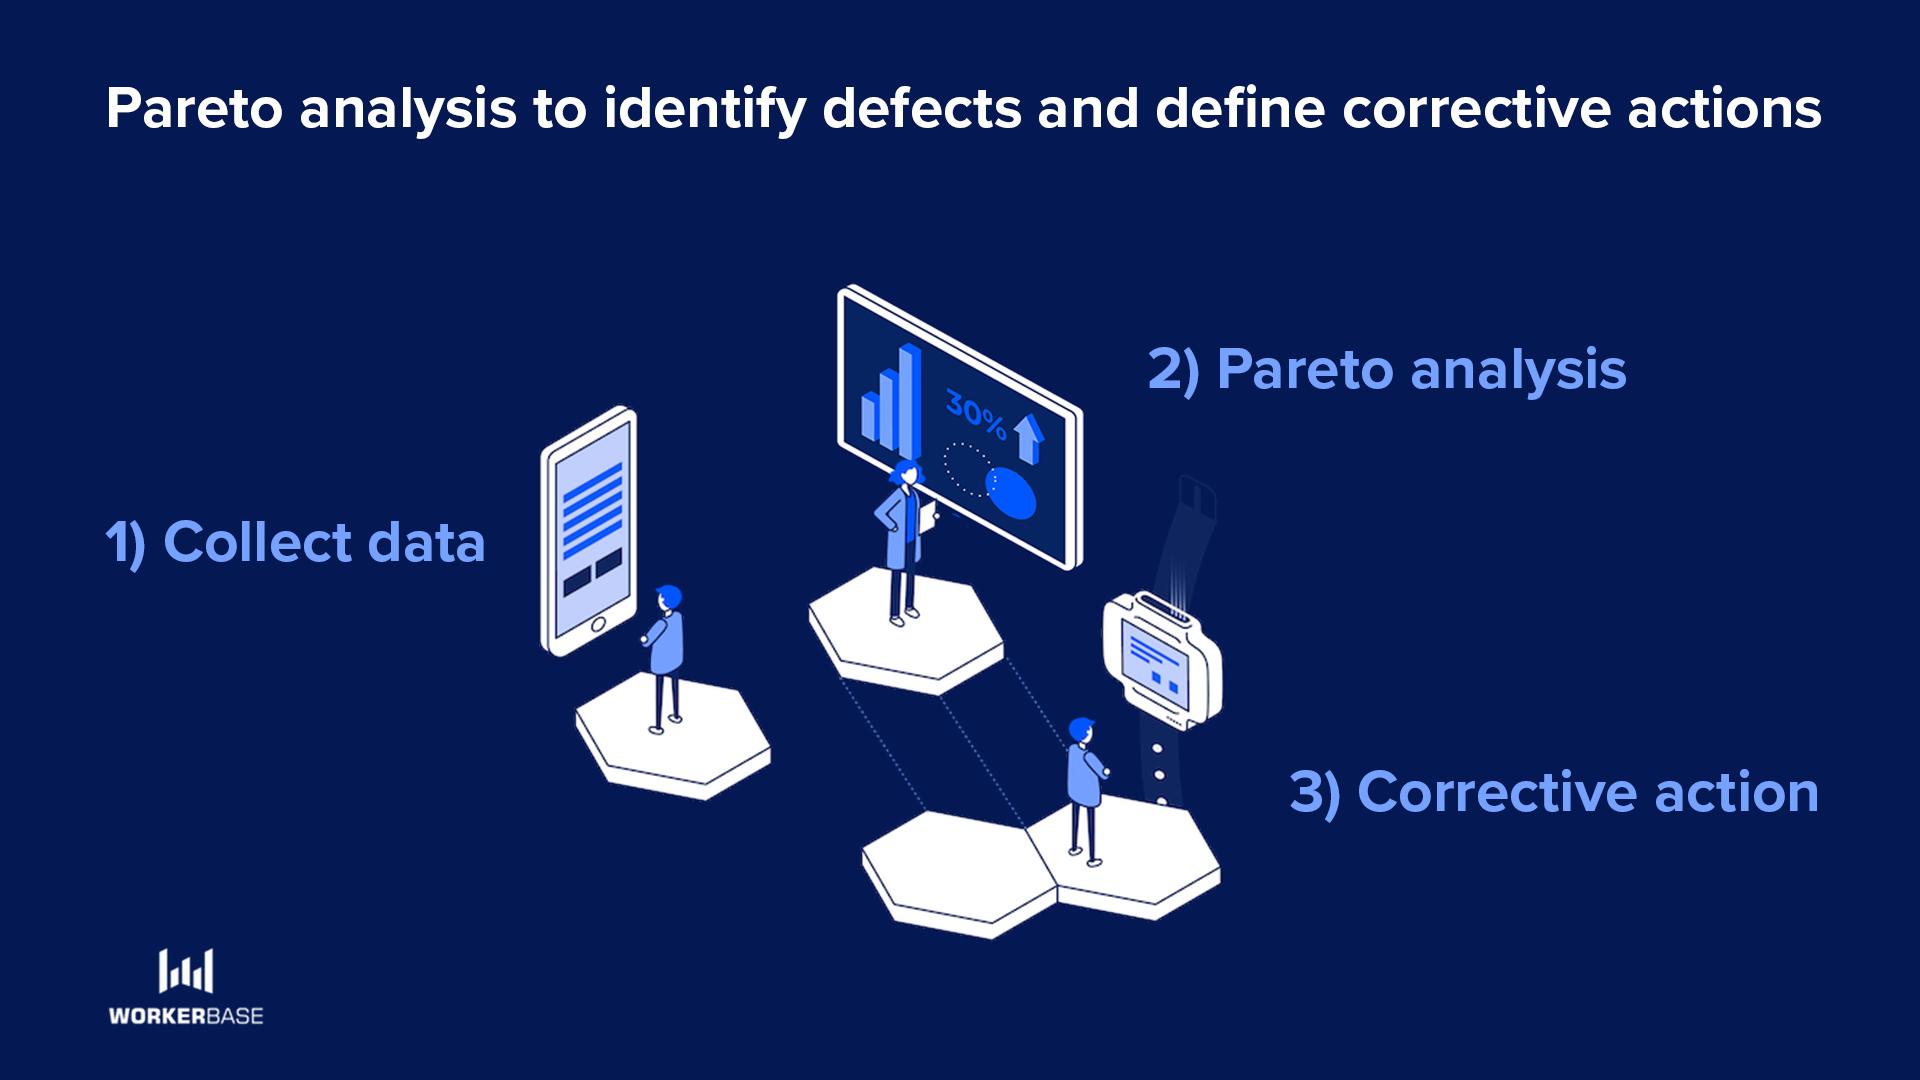 Pareto analysis to identify defects